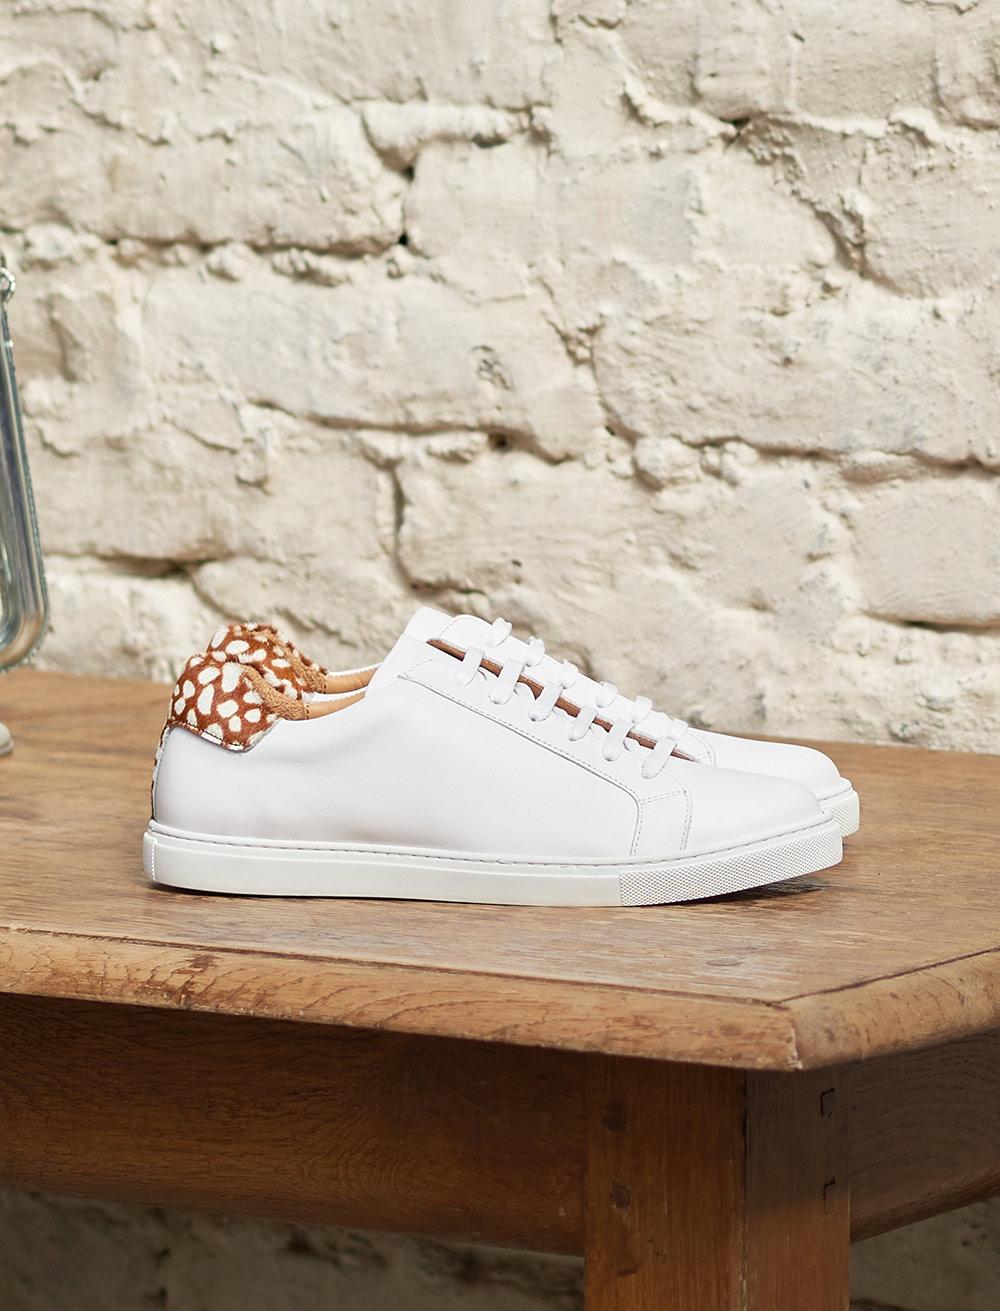 Sneakers Olivia - Blanc et biche